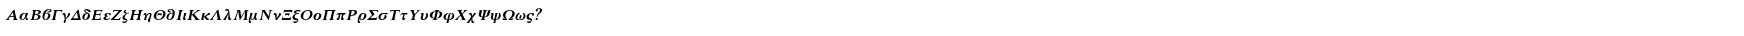 katsoulidis-bolditalic-webfont.ttf